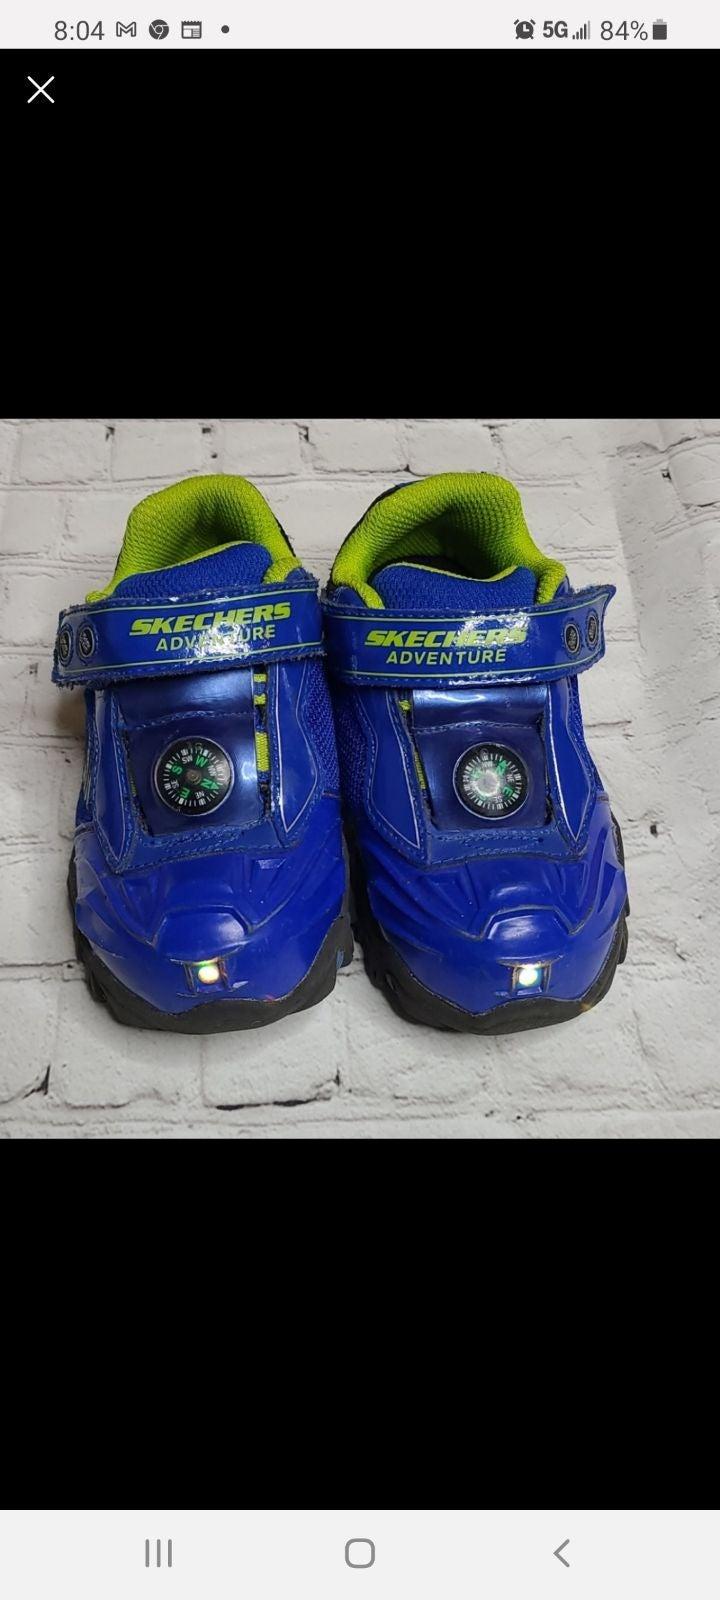 SKECHERS ADVENTURE Trail Shoes